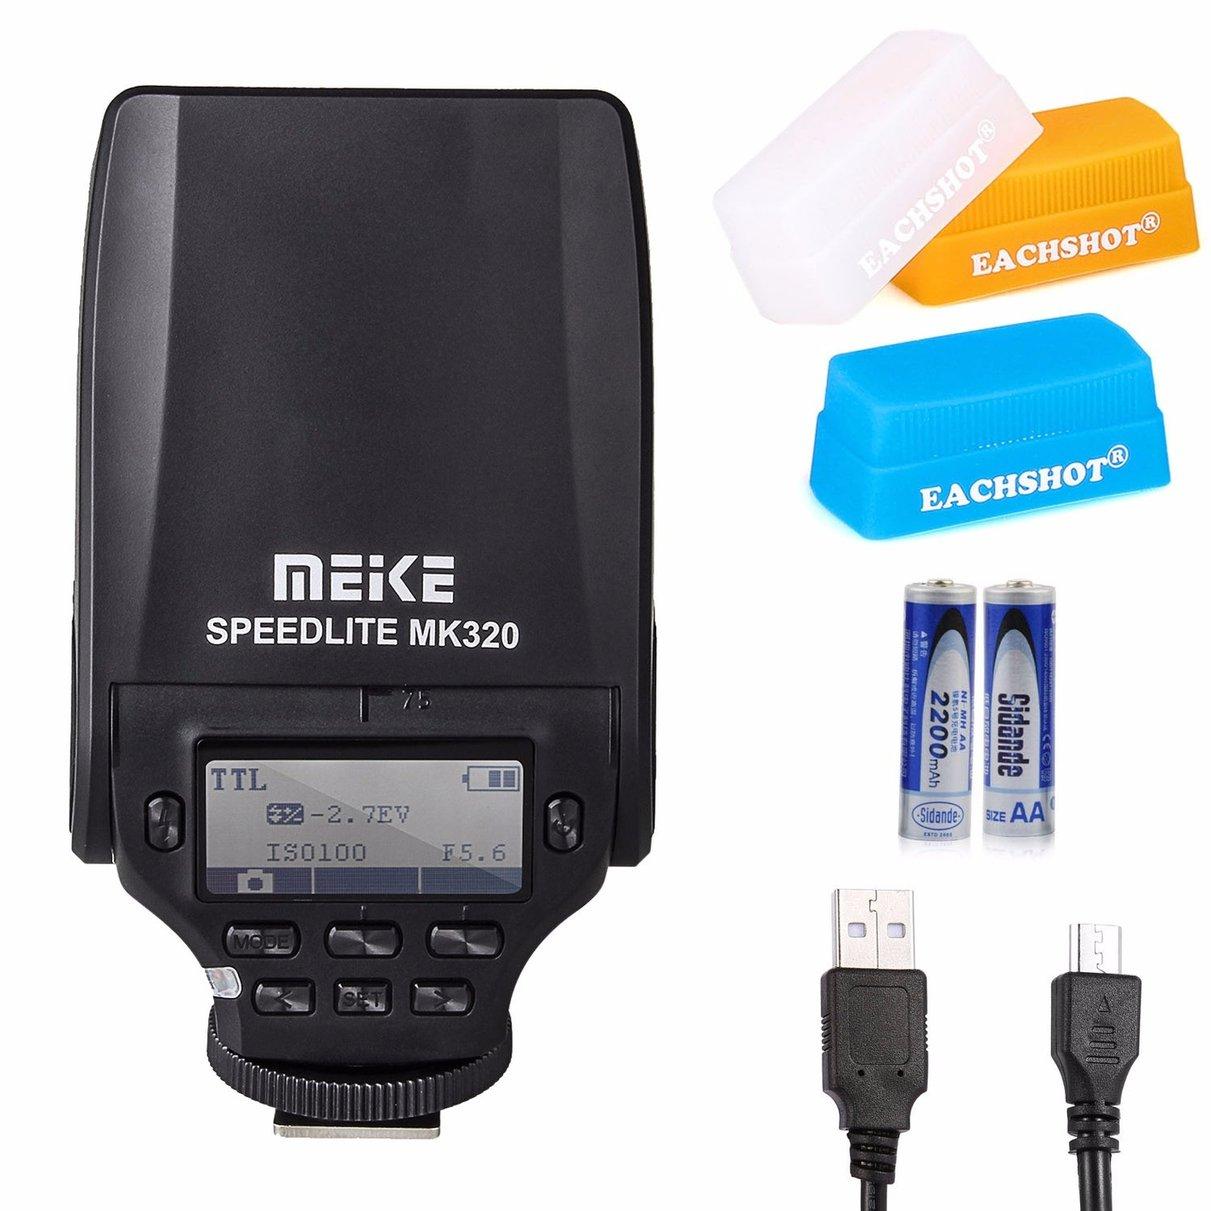 МАЙКЕ MK-320 Вспышка TTL Speedlite для Olympus С EACHSHOT Micro USB + 2 ШТ. АА Батареи + 3 ШТ. Силиконовые Диффузор